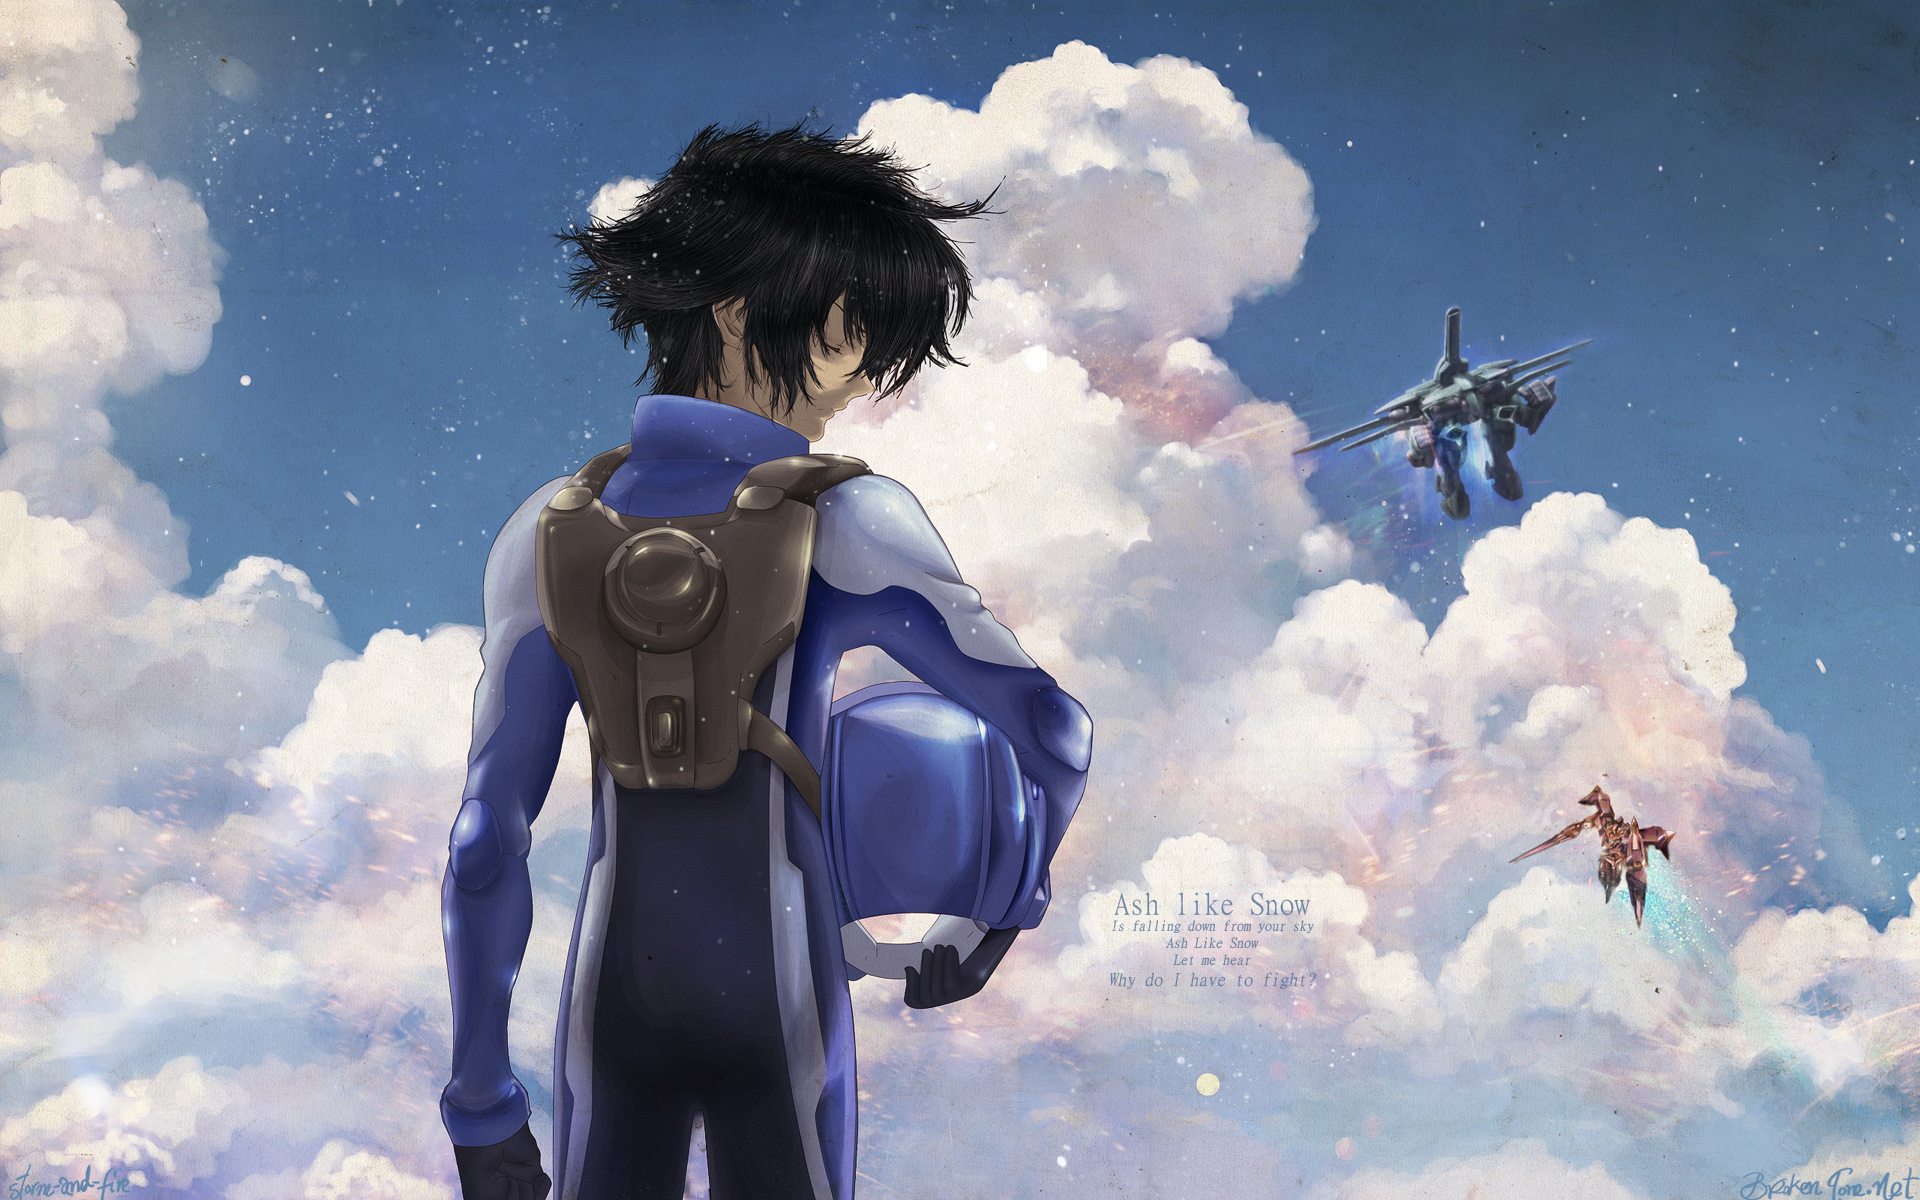 Setsuna F Seiei Mobile Suit Gundam 00 Wallpaper 1023744 Zerochan Anime Image Board